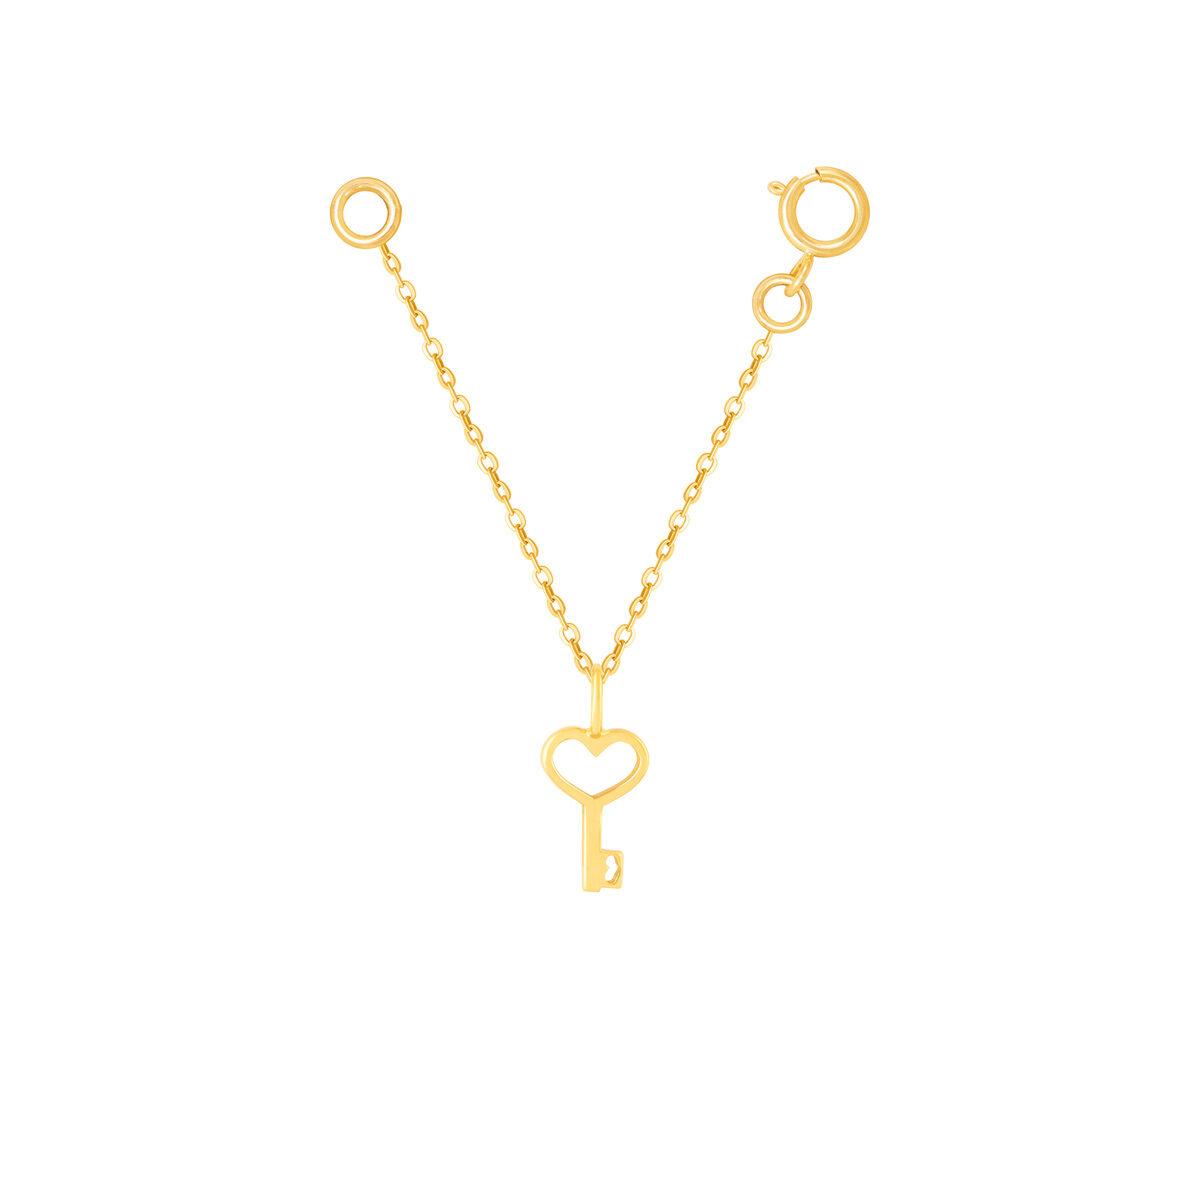 آویز ساعت طلا قلب و کلید